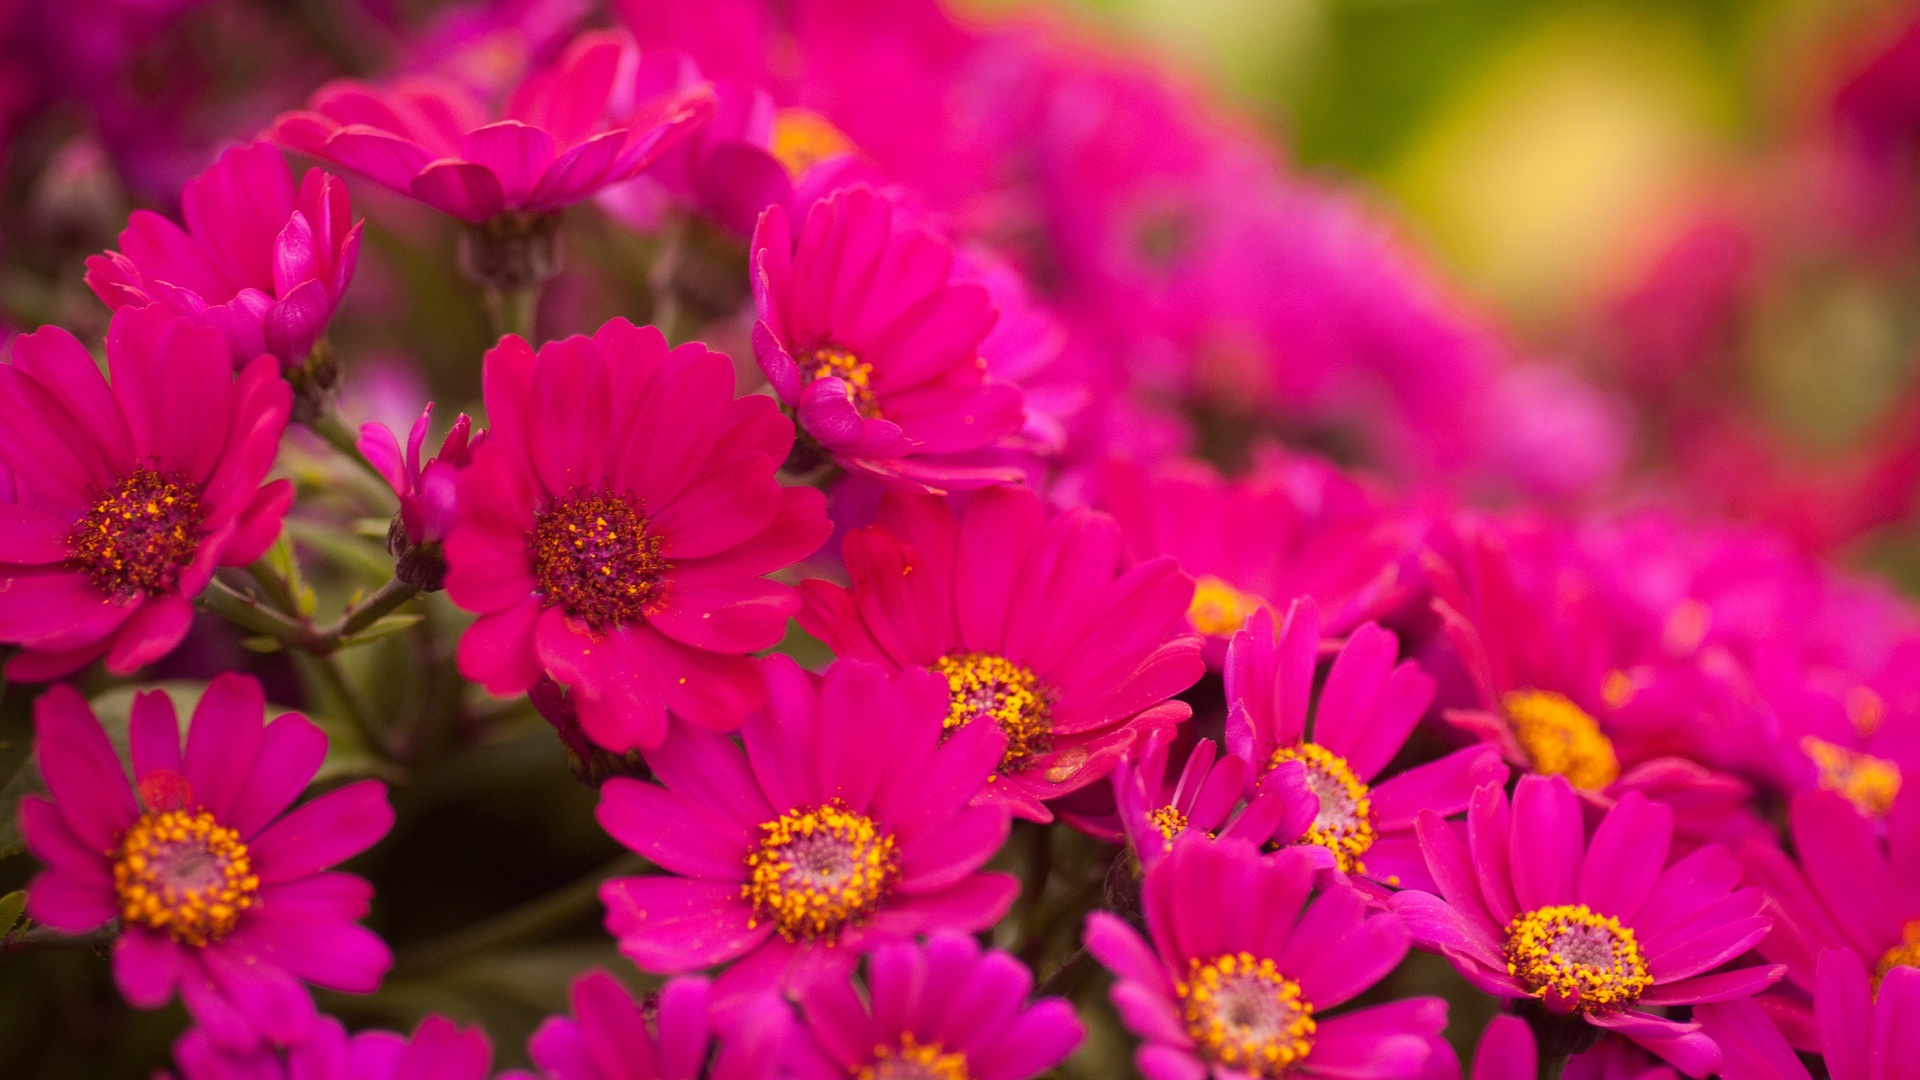 Pink Flowers. Amazing Pink Flowers Wallpaper